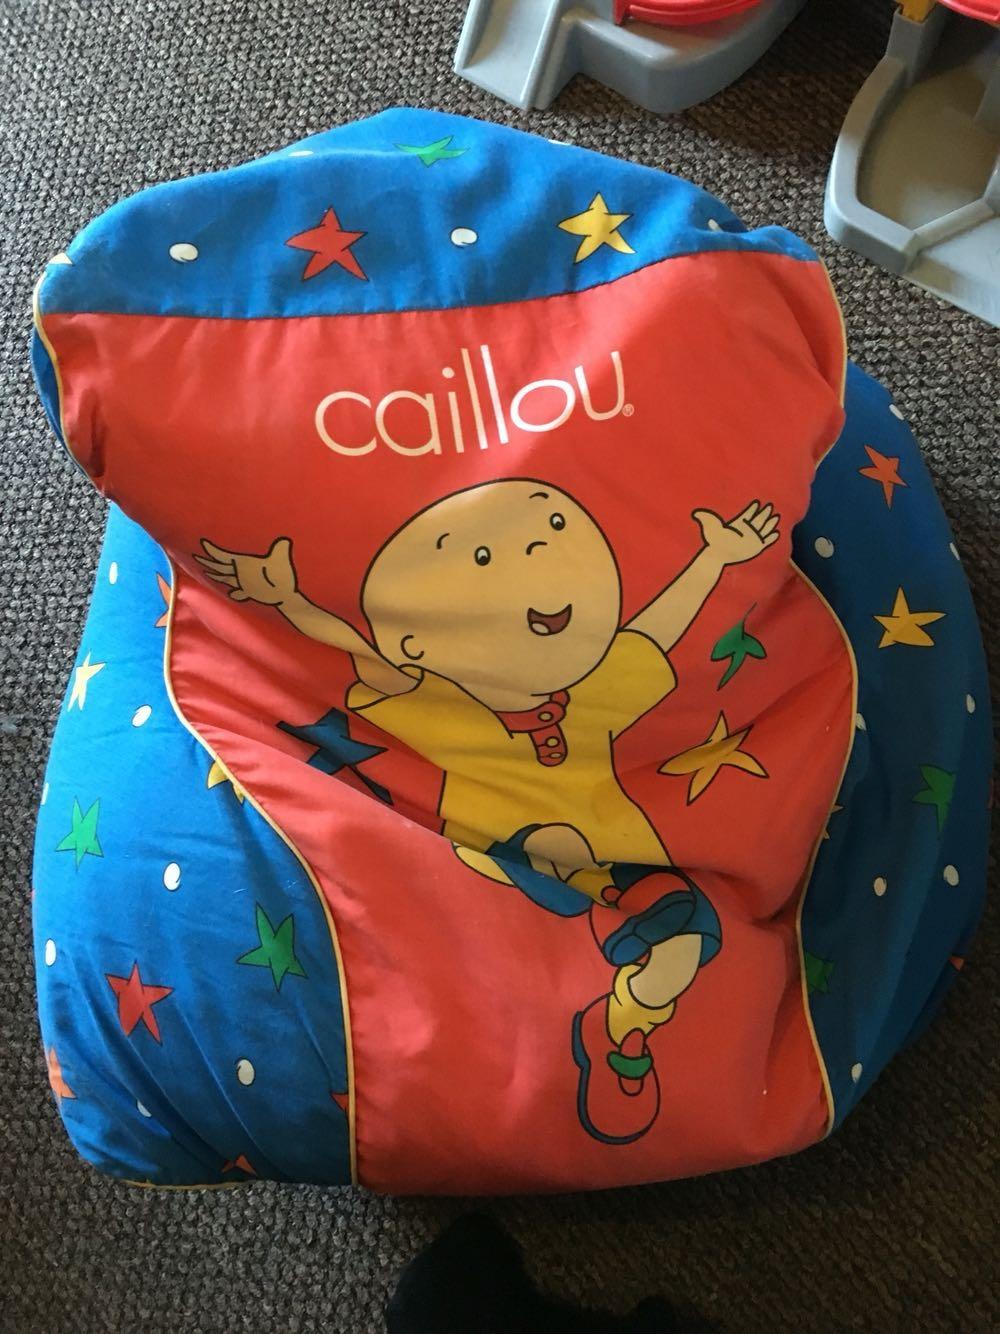 Best Caillou Bean Bag Chair For Sale In Regina Saskatchewan 2018